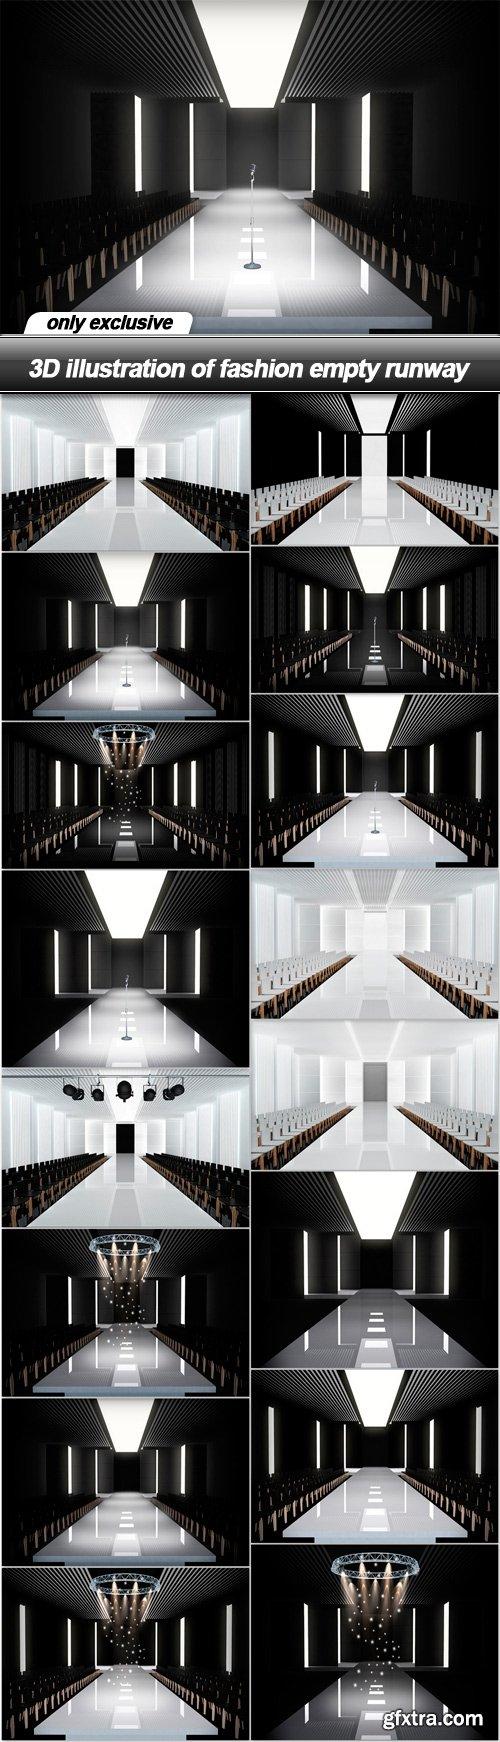 3D illustration of fashion empty runway - 16 UHQ JPEG